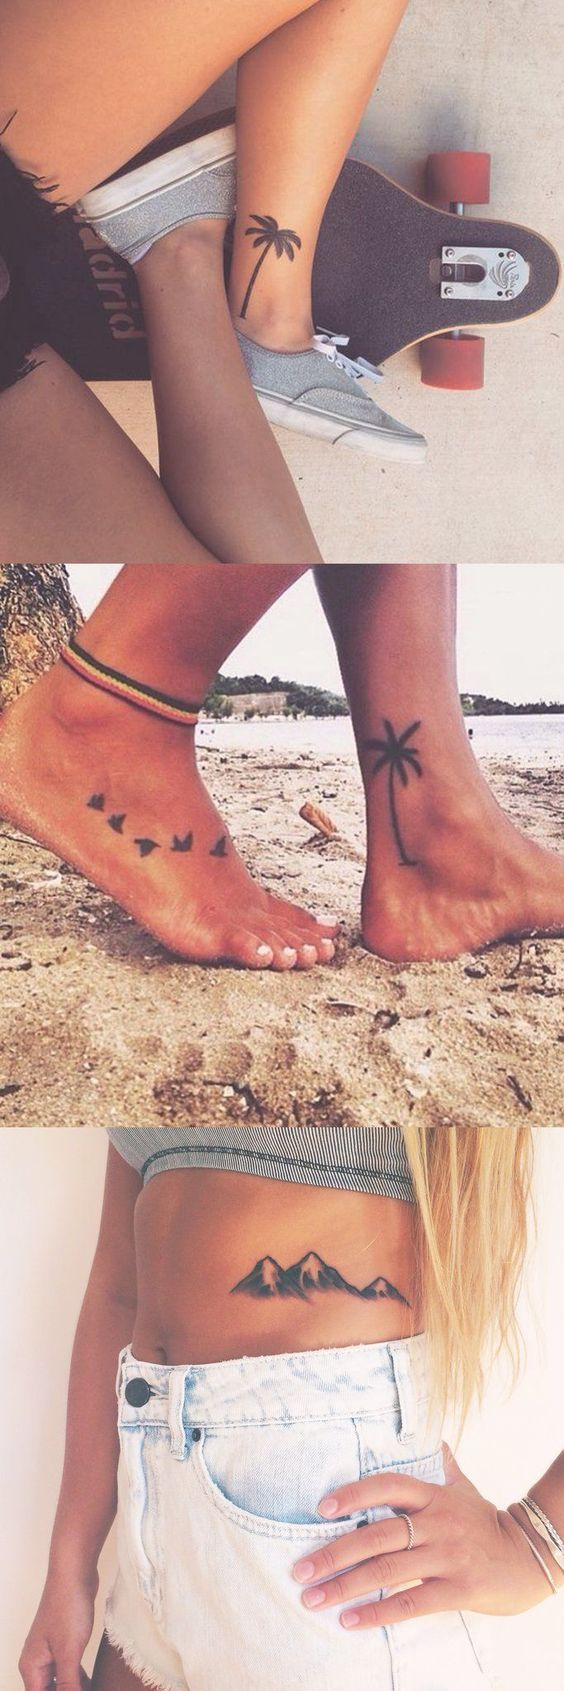 Palm Tree Tattoo Ideas For Women Black Flower Ankle Foot Tatt